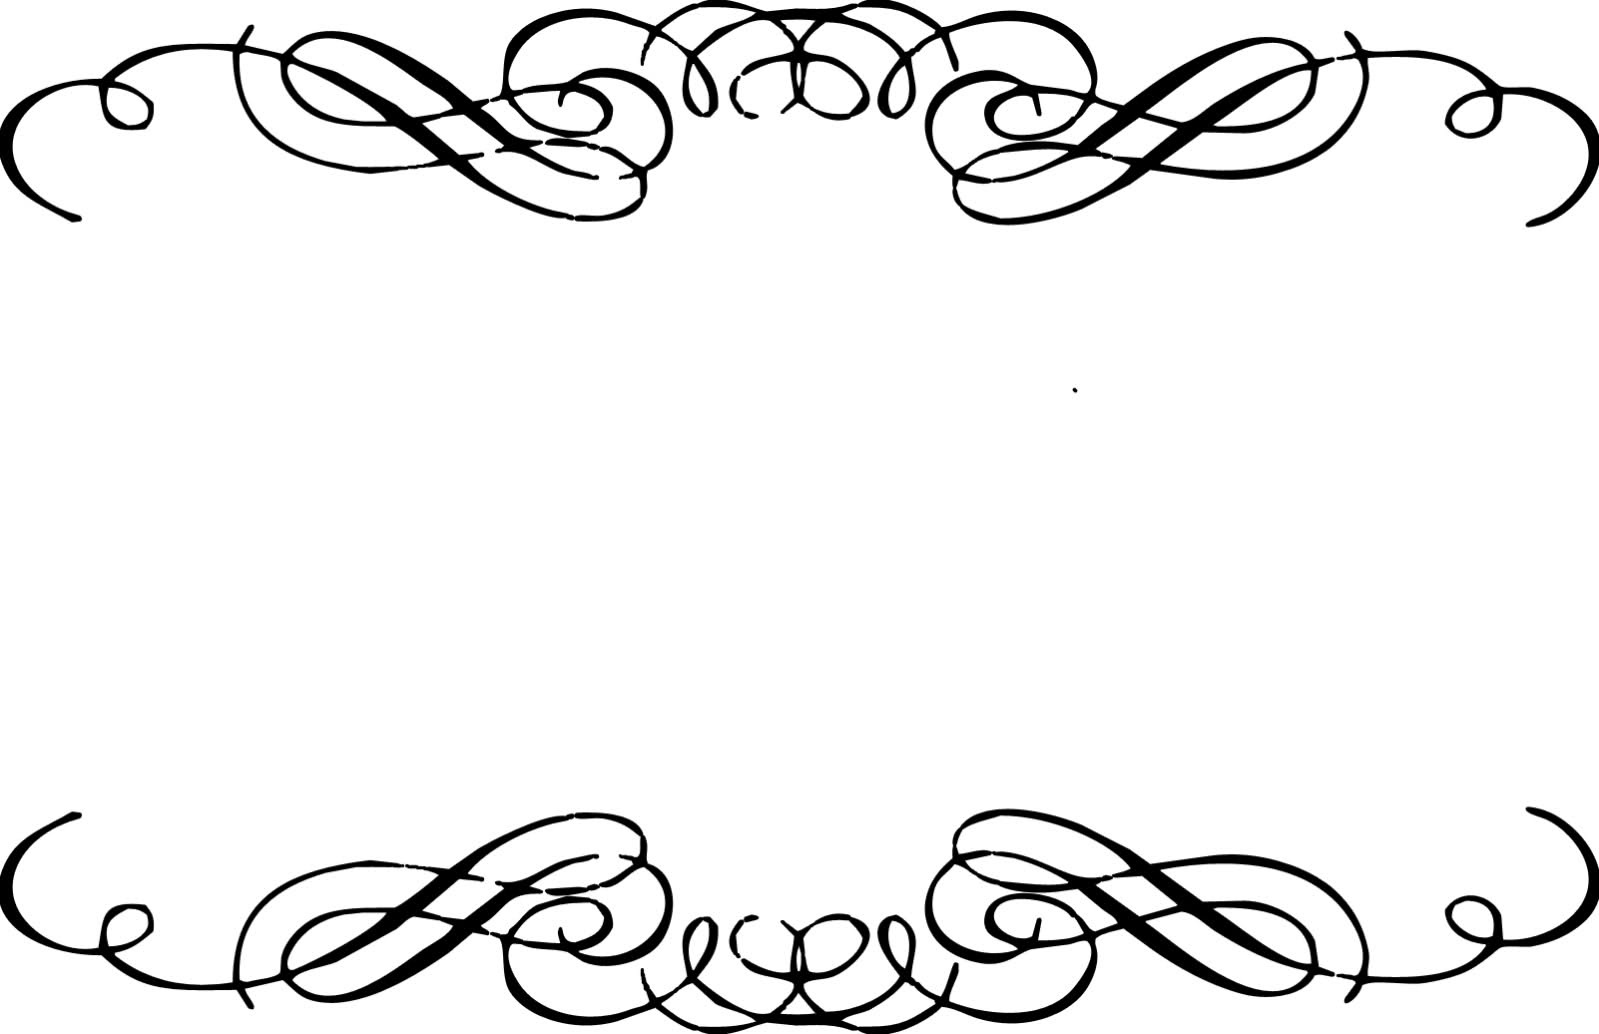 Free Free Wedding Border Clipart, Download Free Clip Art, Free Clip - Free Printable Wedding Clipart Borders